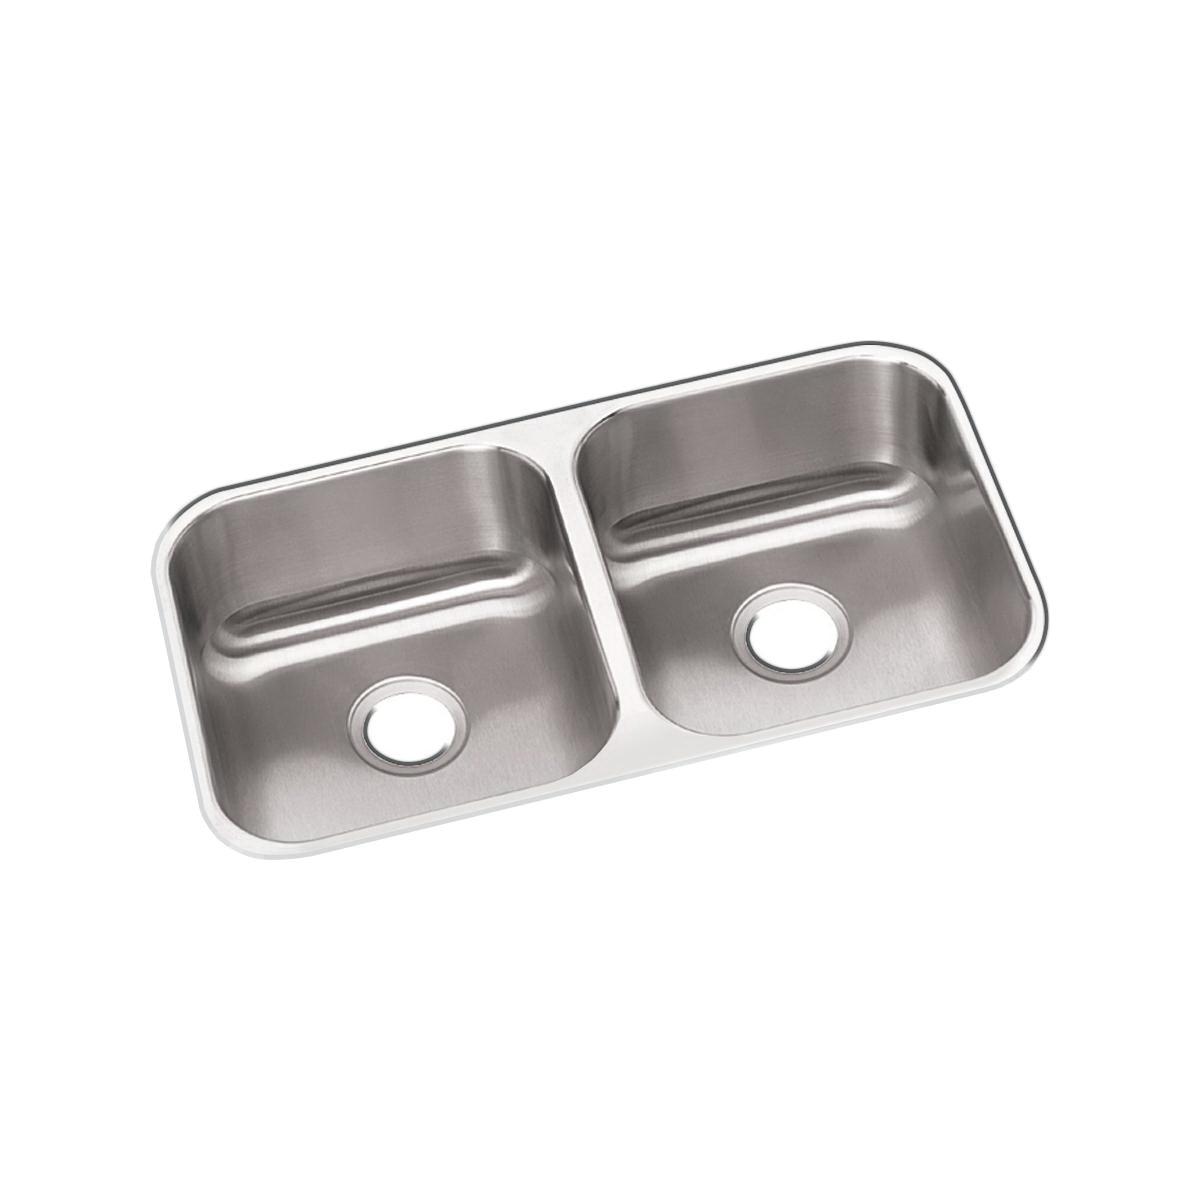 Elkay® DXUH3118 Kitchen Sink, Dayton®, Rectangular, 14 in L x 15-3/4 in W x 8 in D Left Bowl, 14 in L x 15-3/4 in W x 8 in D Right Bowl, 31-3/4 in L x 18-1/4 in W x 8 in H, Under Mount, 18 ga 304 Stainless Steel, Radiant Satin